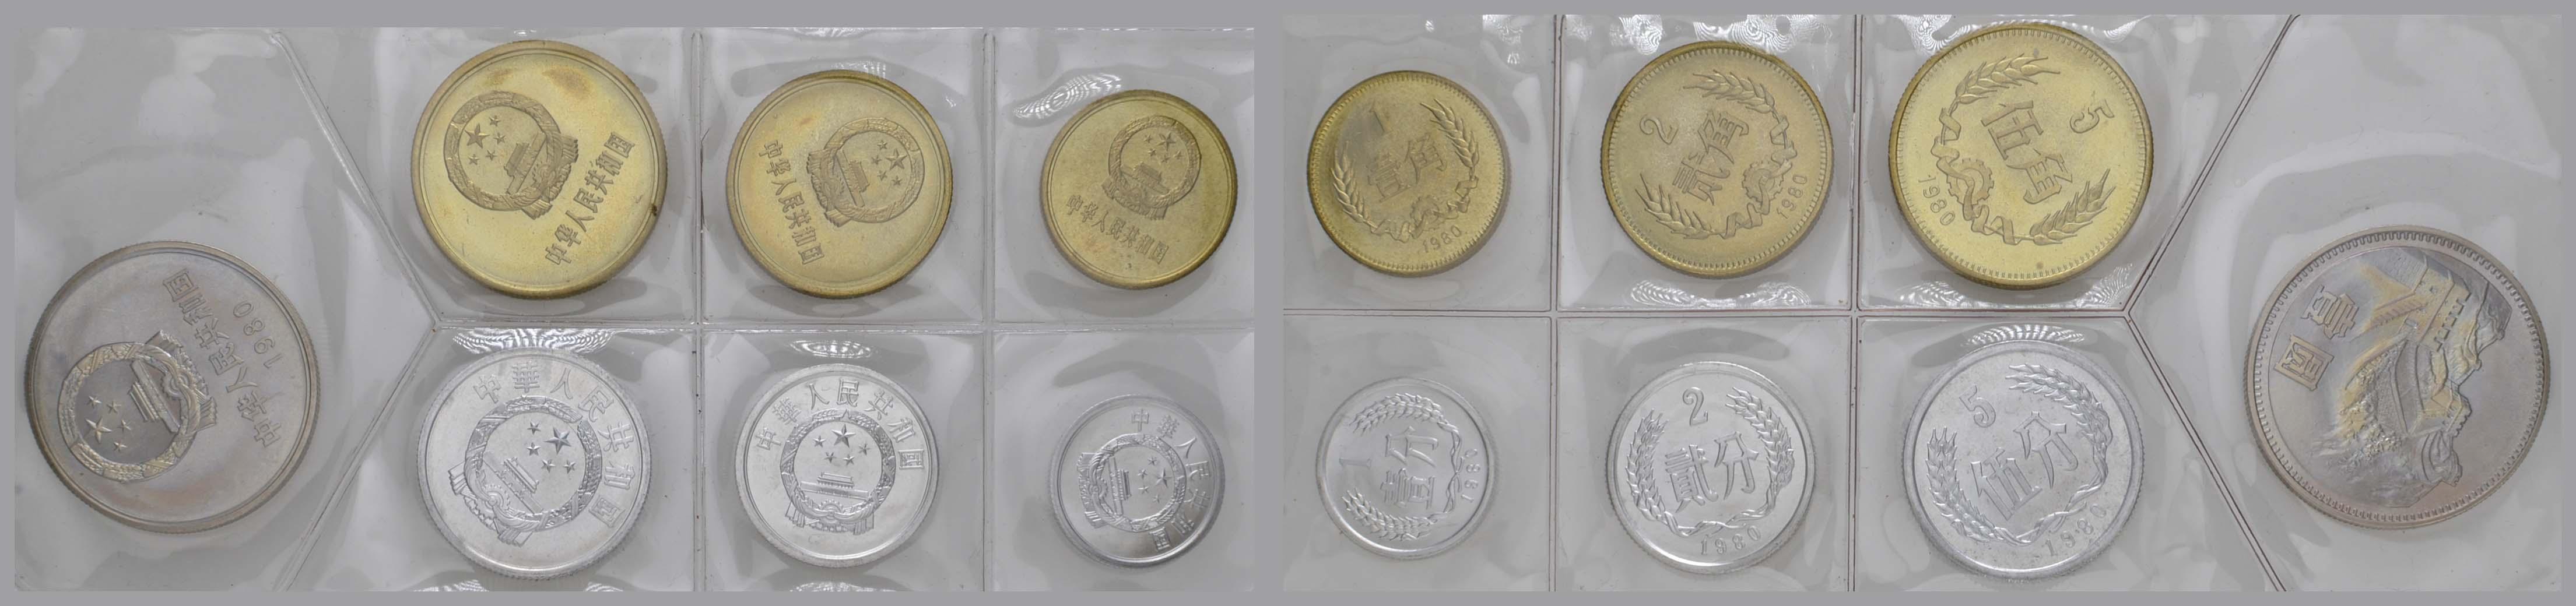 Lot 1899 - übersee China -  Auktionshaus Ulrich Felzmann GmbH & Co. KG Coins single lots